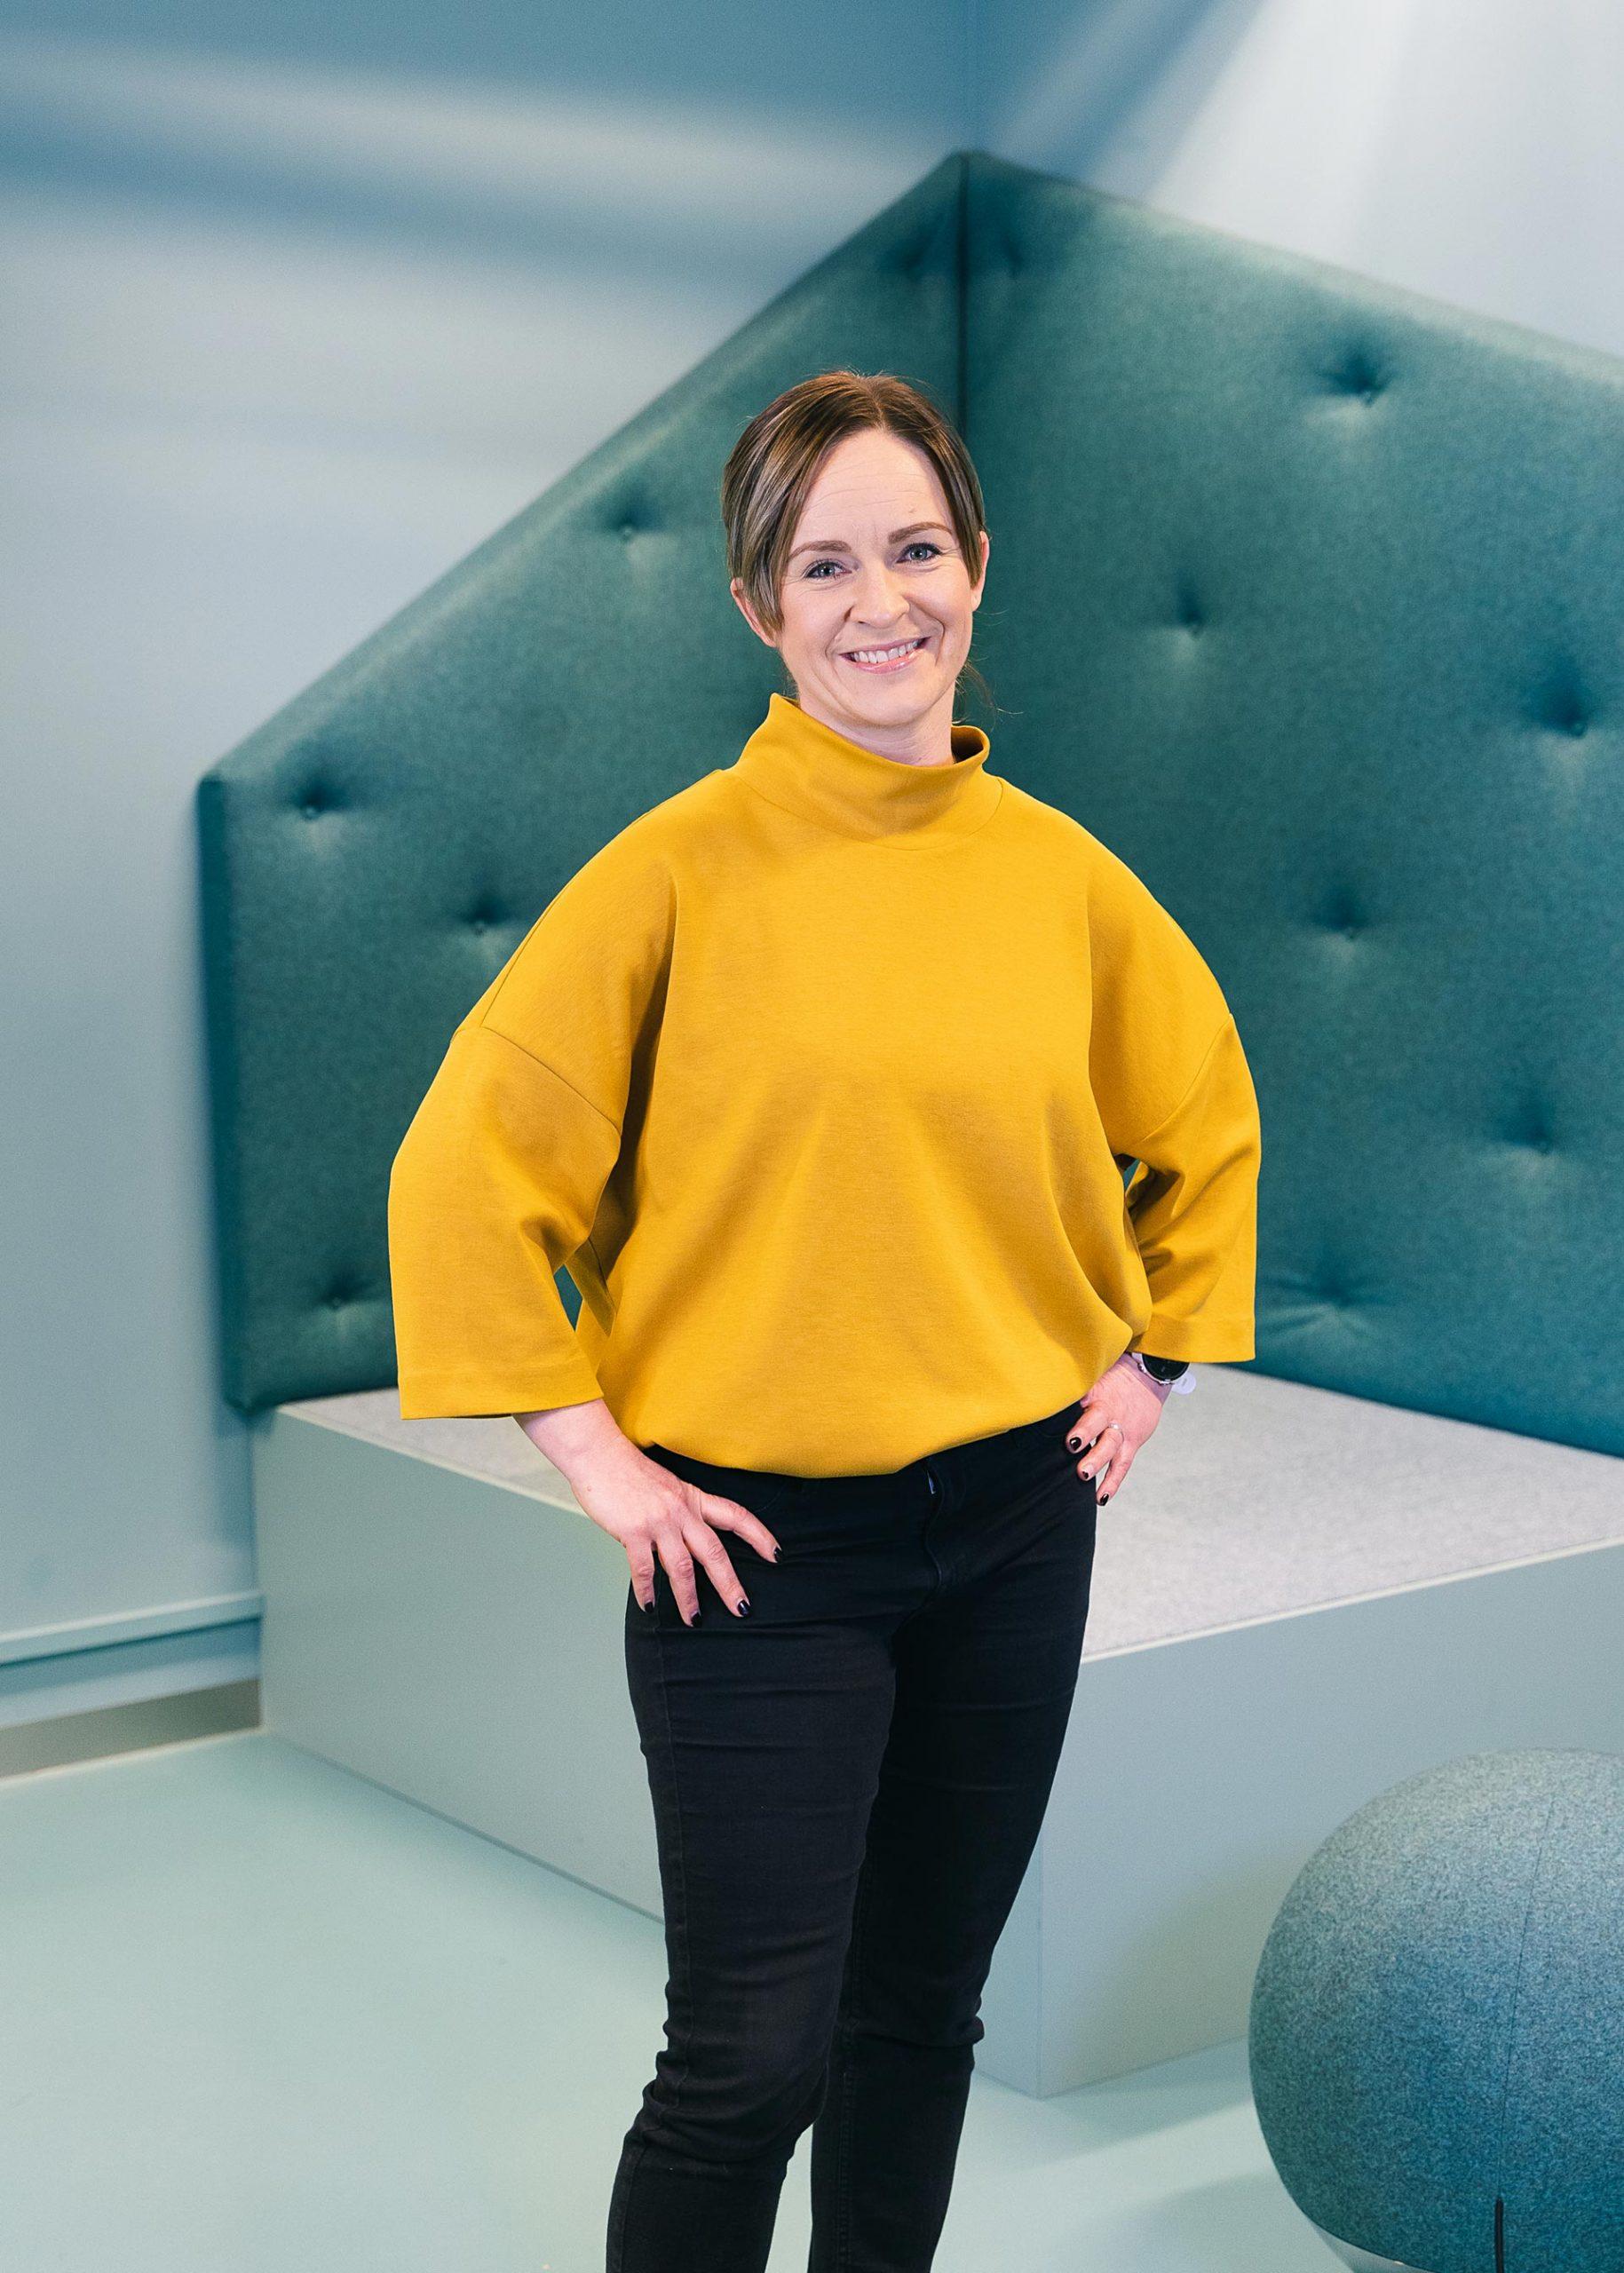 Liz Danielsson, domänexpert Kontek. Fotograf: Matilda Hildingsson